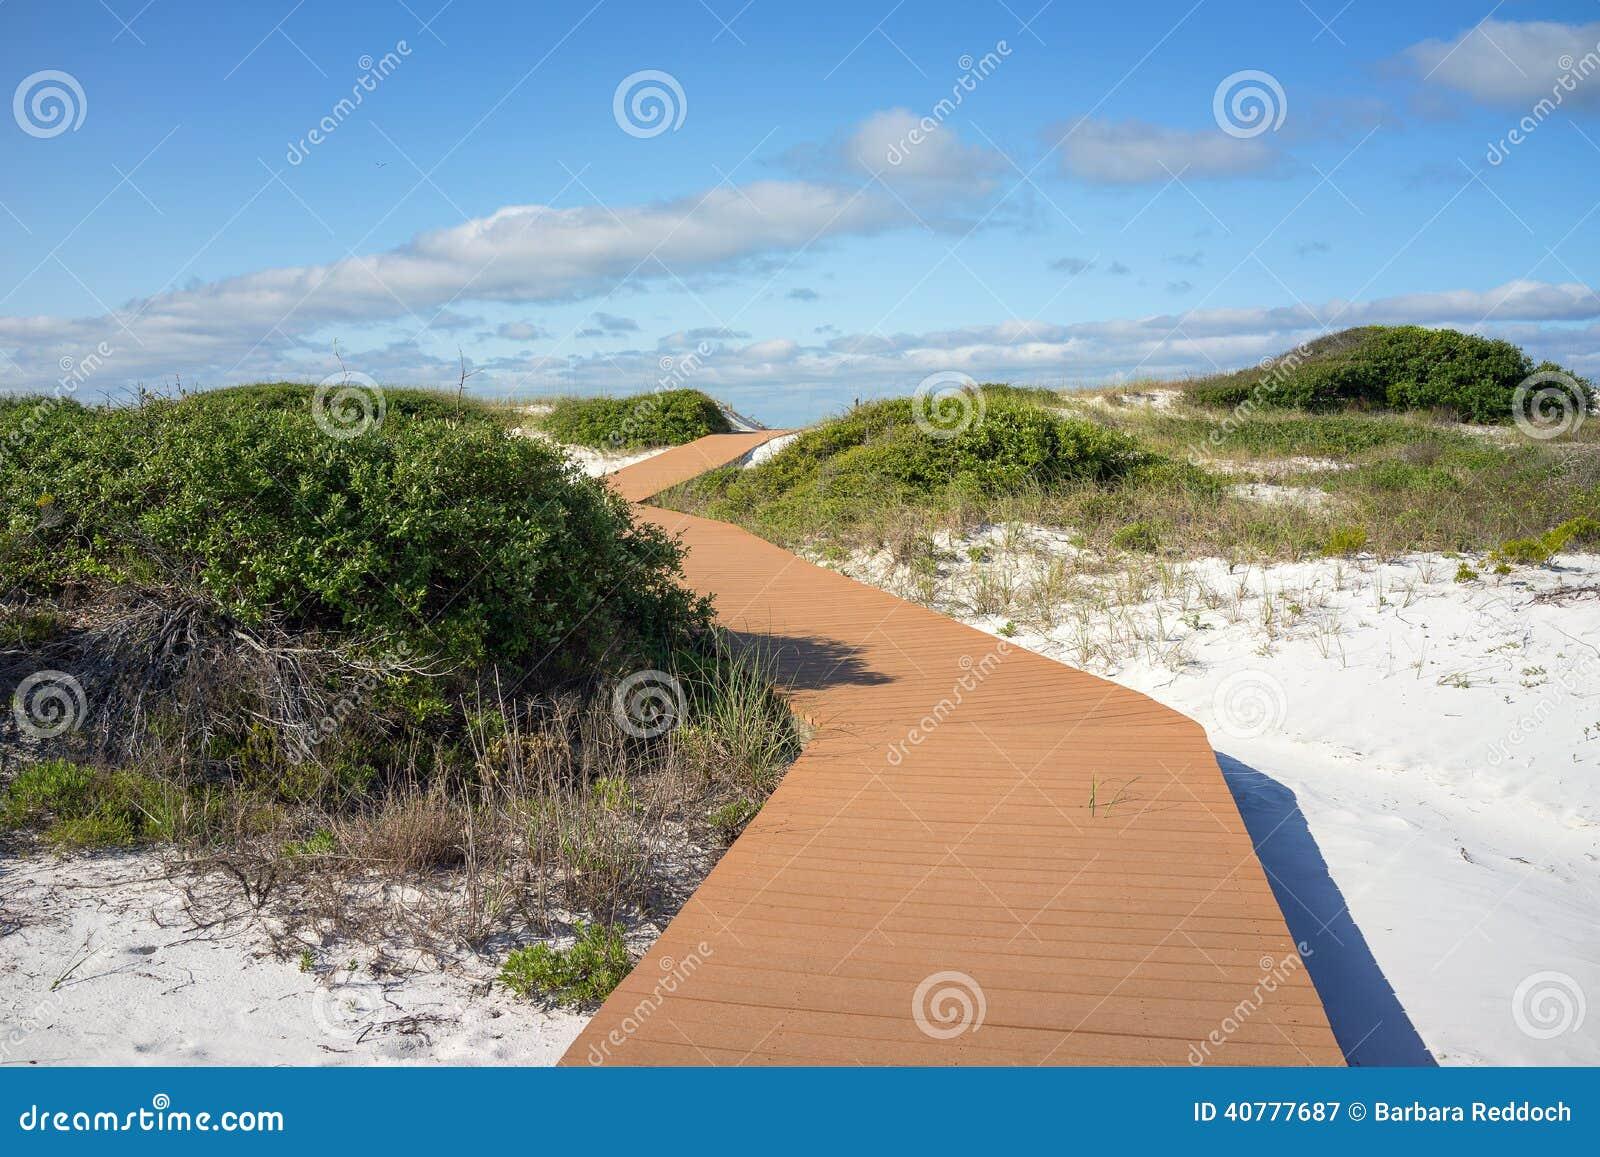 Pensacola Beach National Park